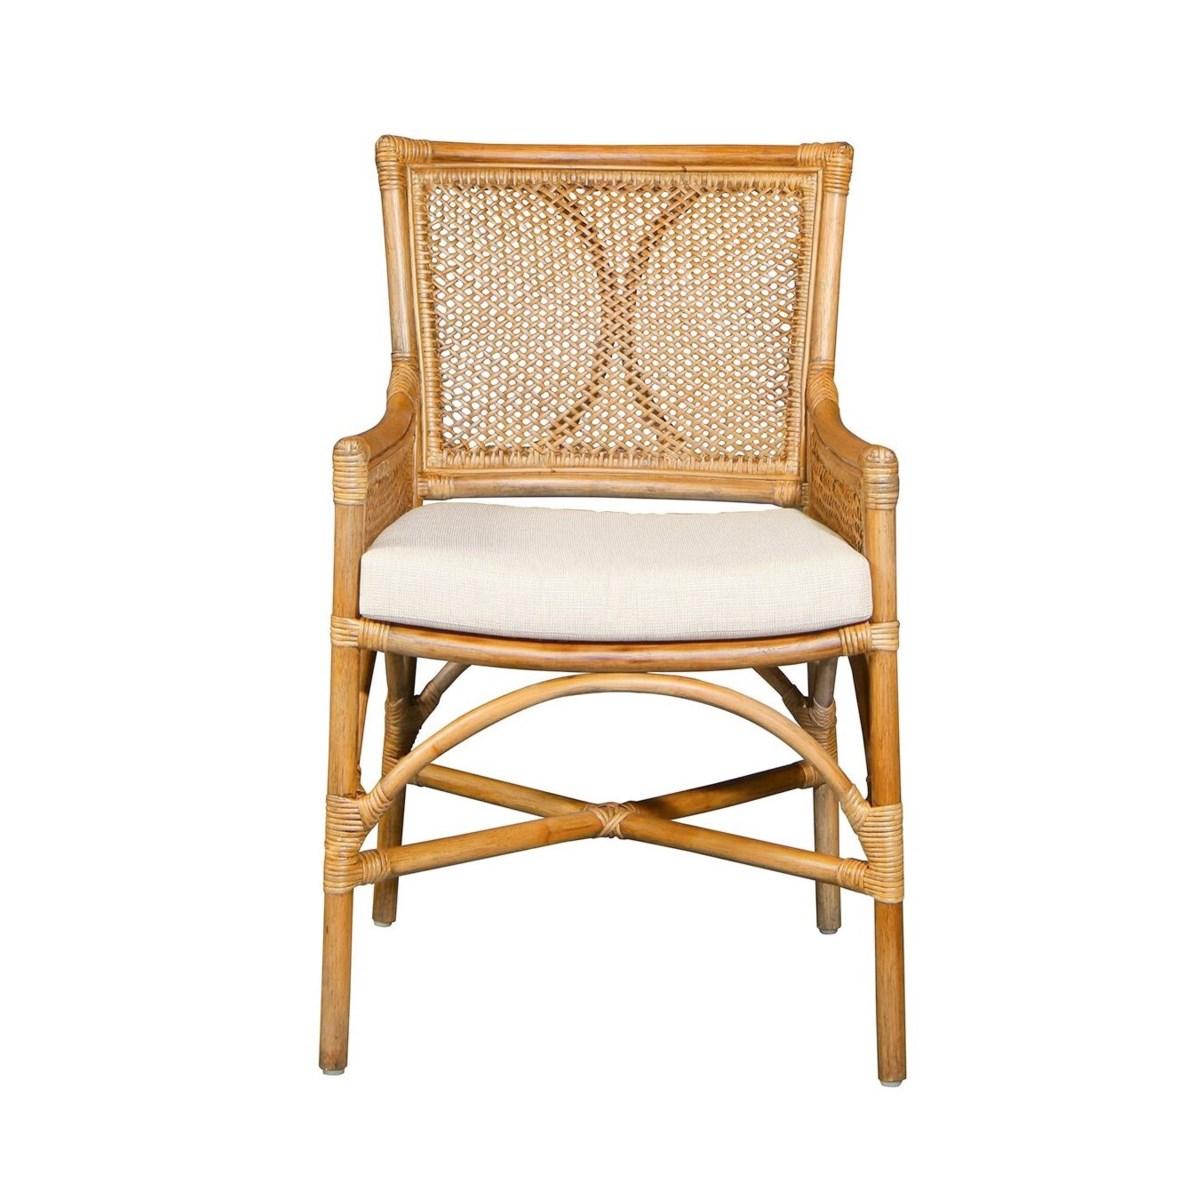 Java Arm Chair Frame Color - Honey Brown Cushion Color - Cream